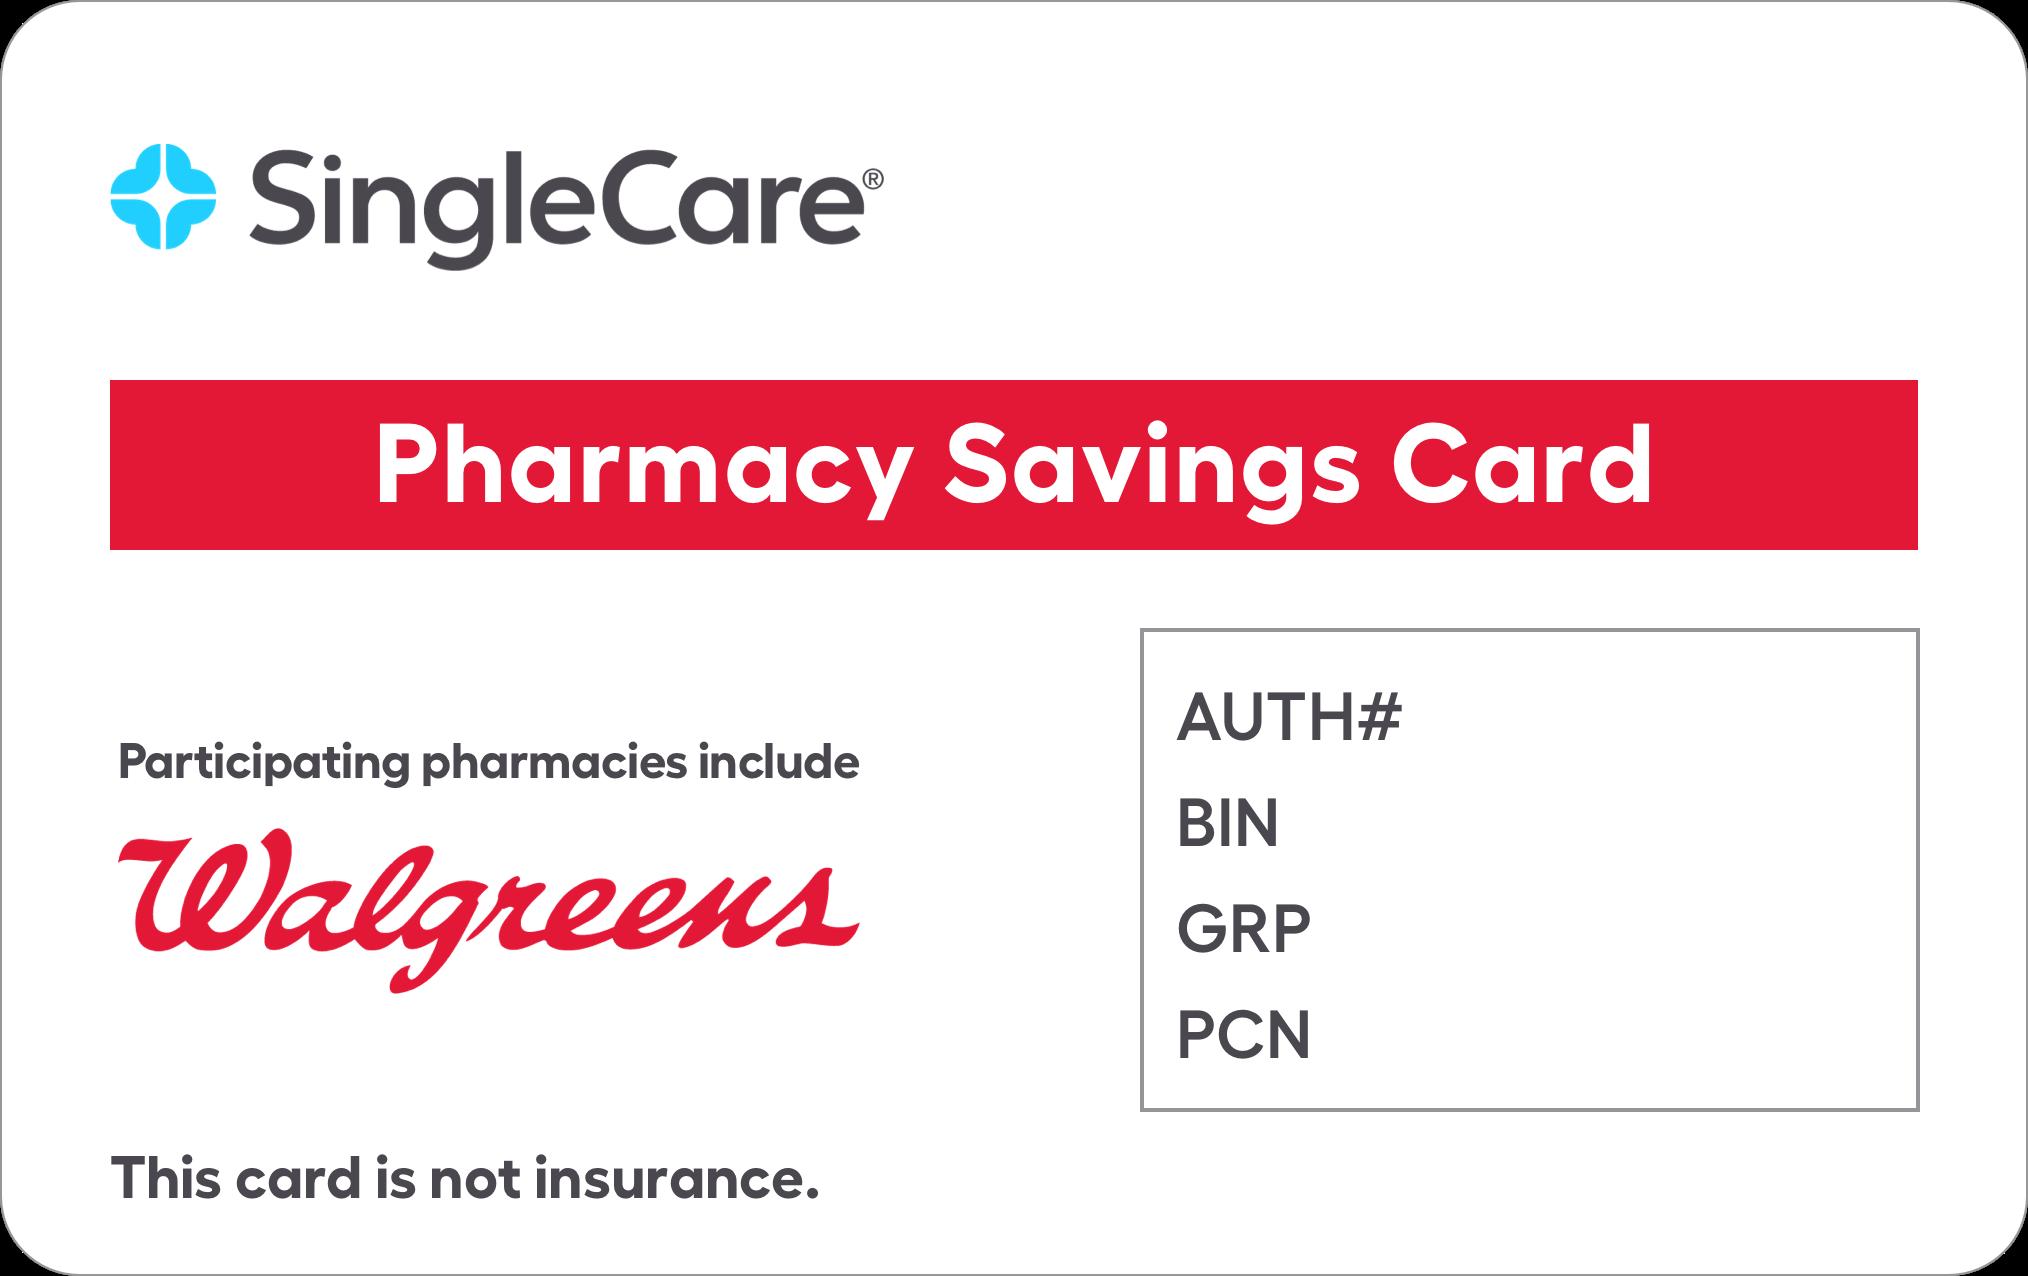 Singlecare walgreens card